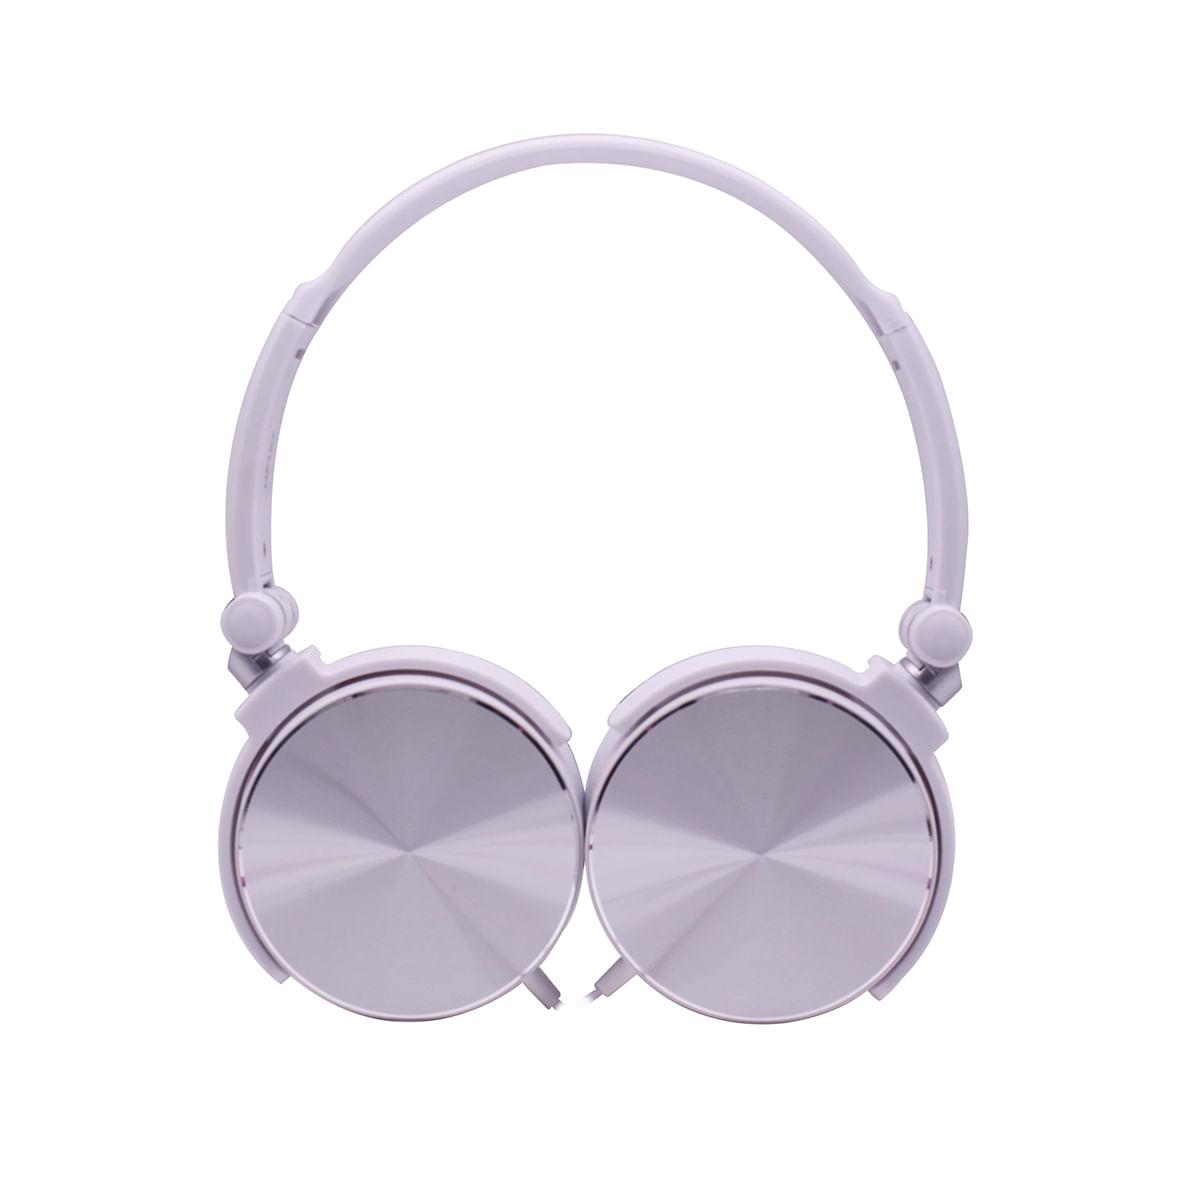 auricular-vincha-blanco